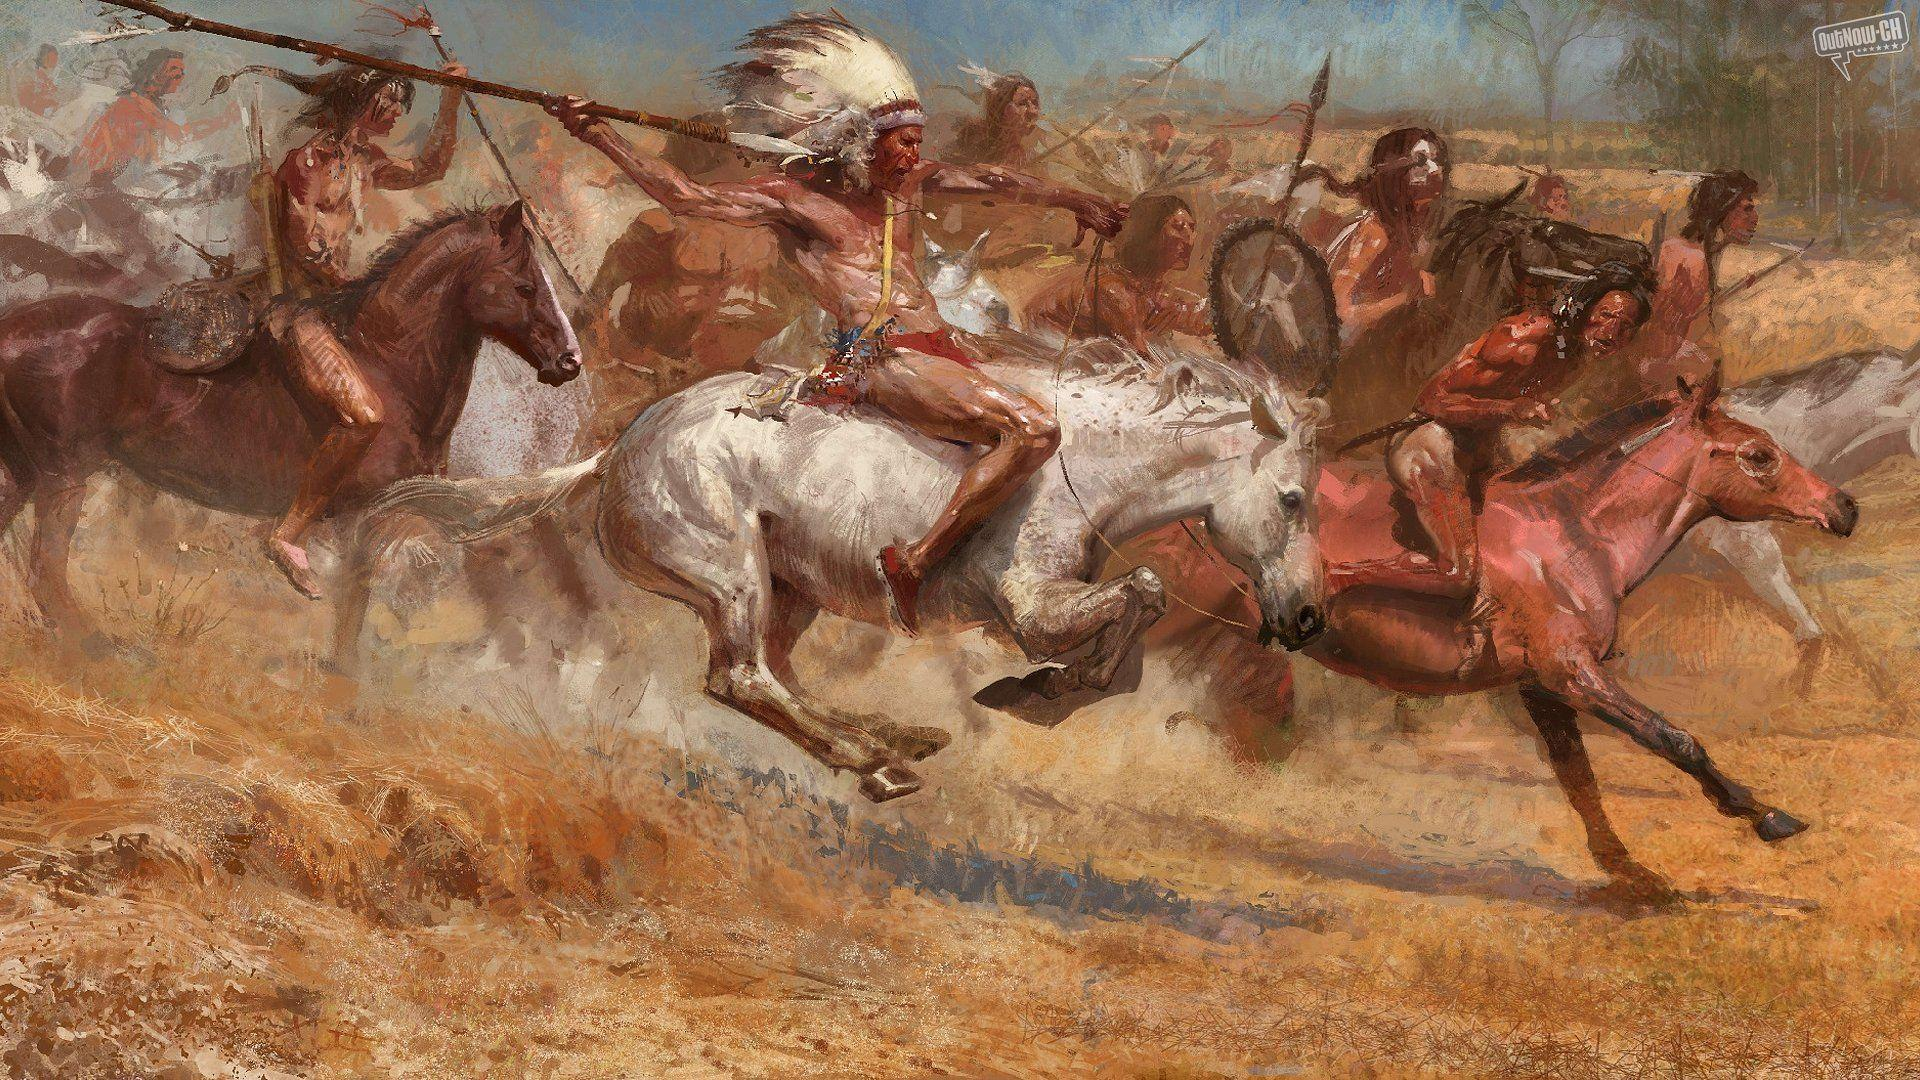 1920x1080 Age of Empires 3: War Chiefs desktop PC and Mac wallpaper